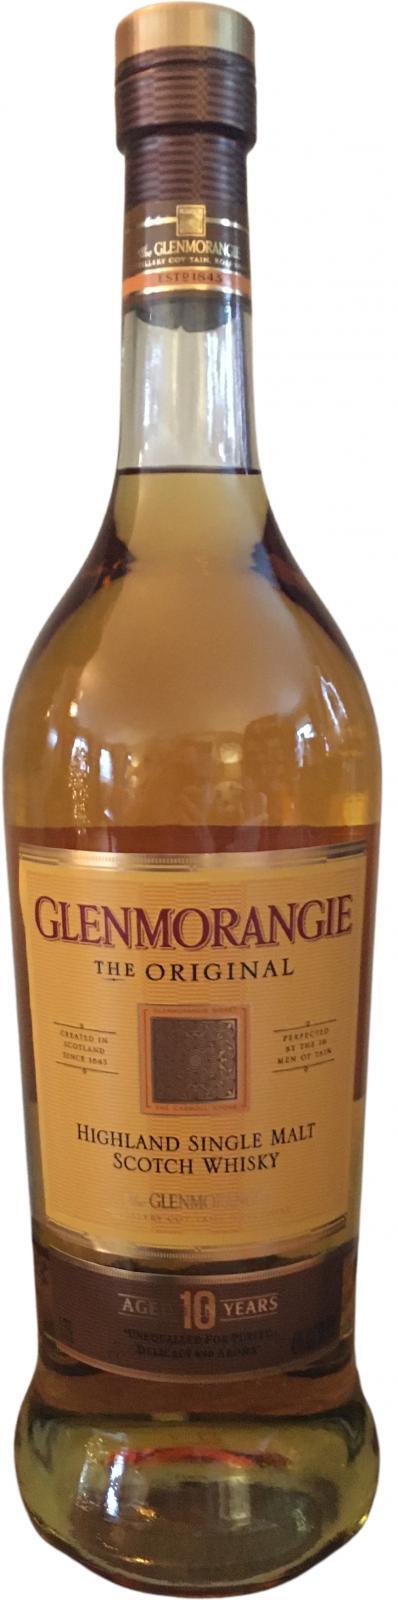 Glenmorangie 10-year-old